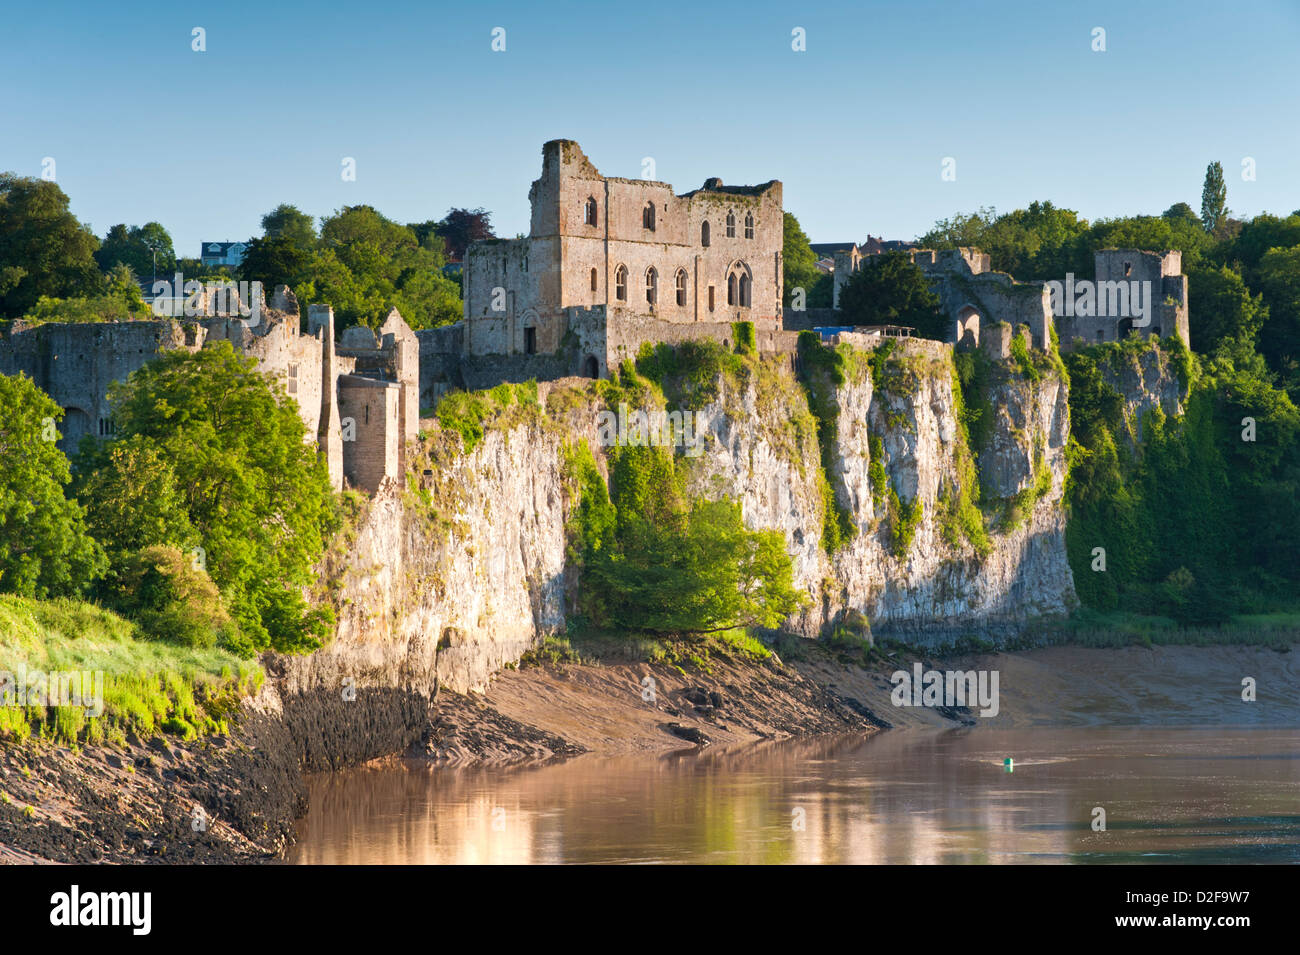 Chepstow Castle e il fiume Wye, Chepstow, Monmouthshire, South Wales, Regno Unito Foto Stock